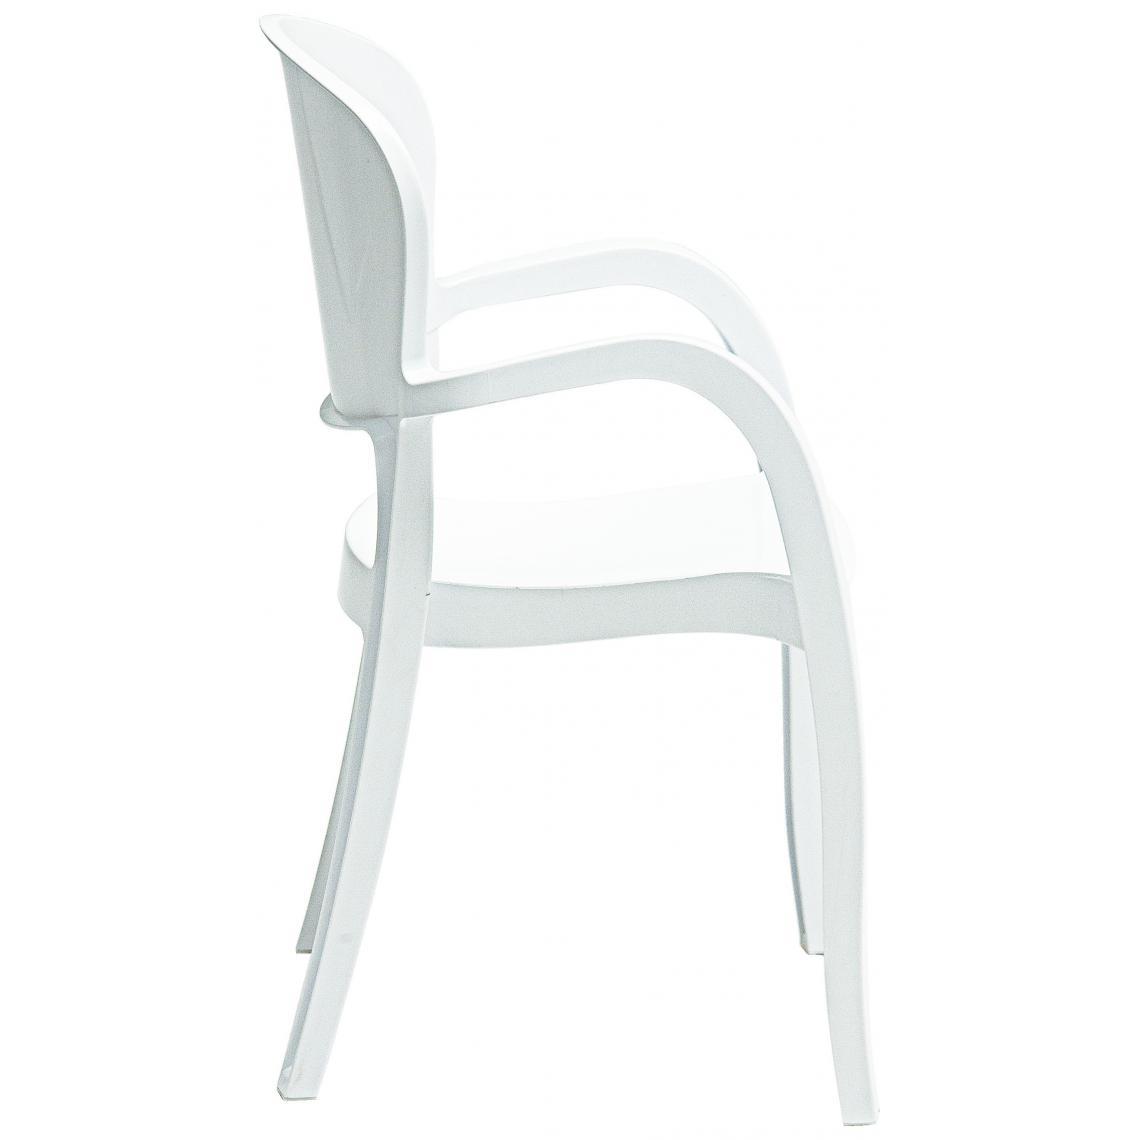 Avec GLAM3 SUISSES Chaise Design Accoudoirs Blanche 3Rc5A4jLSq